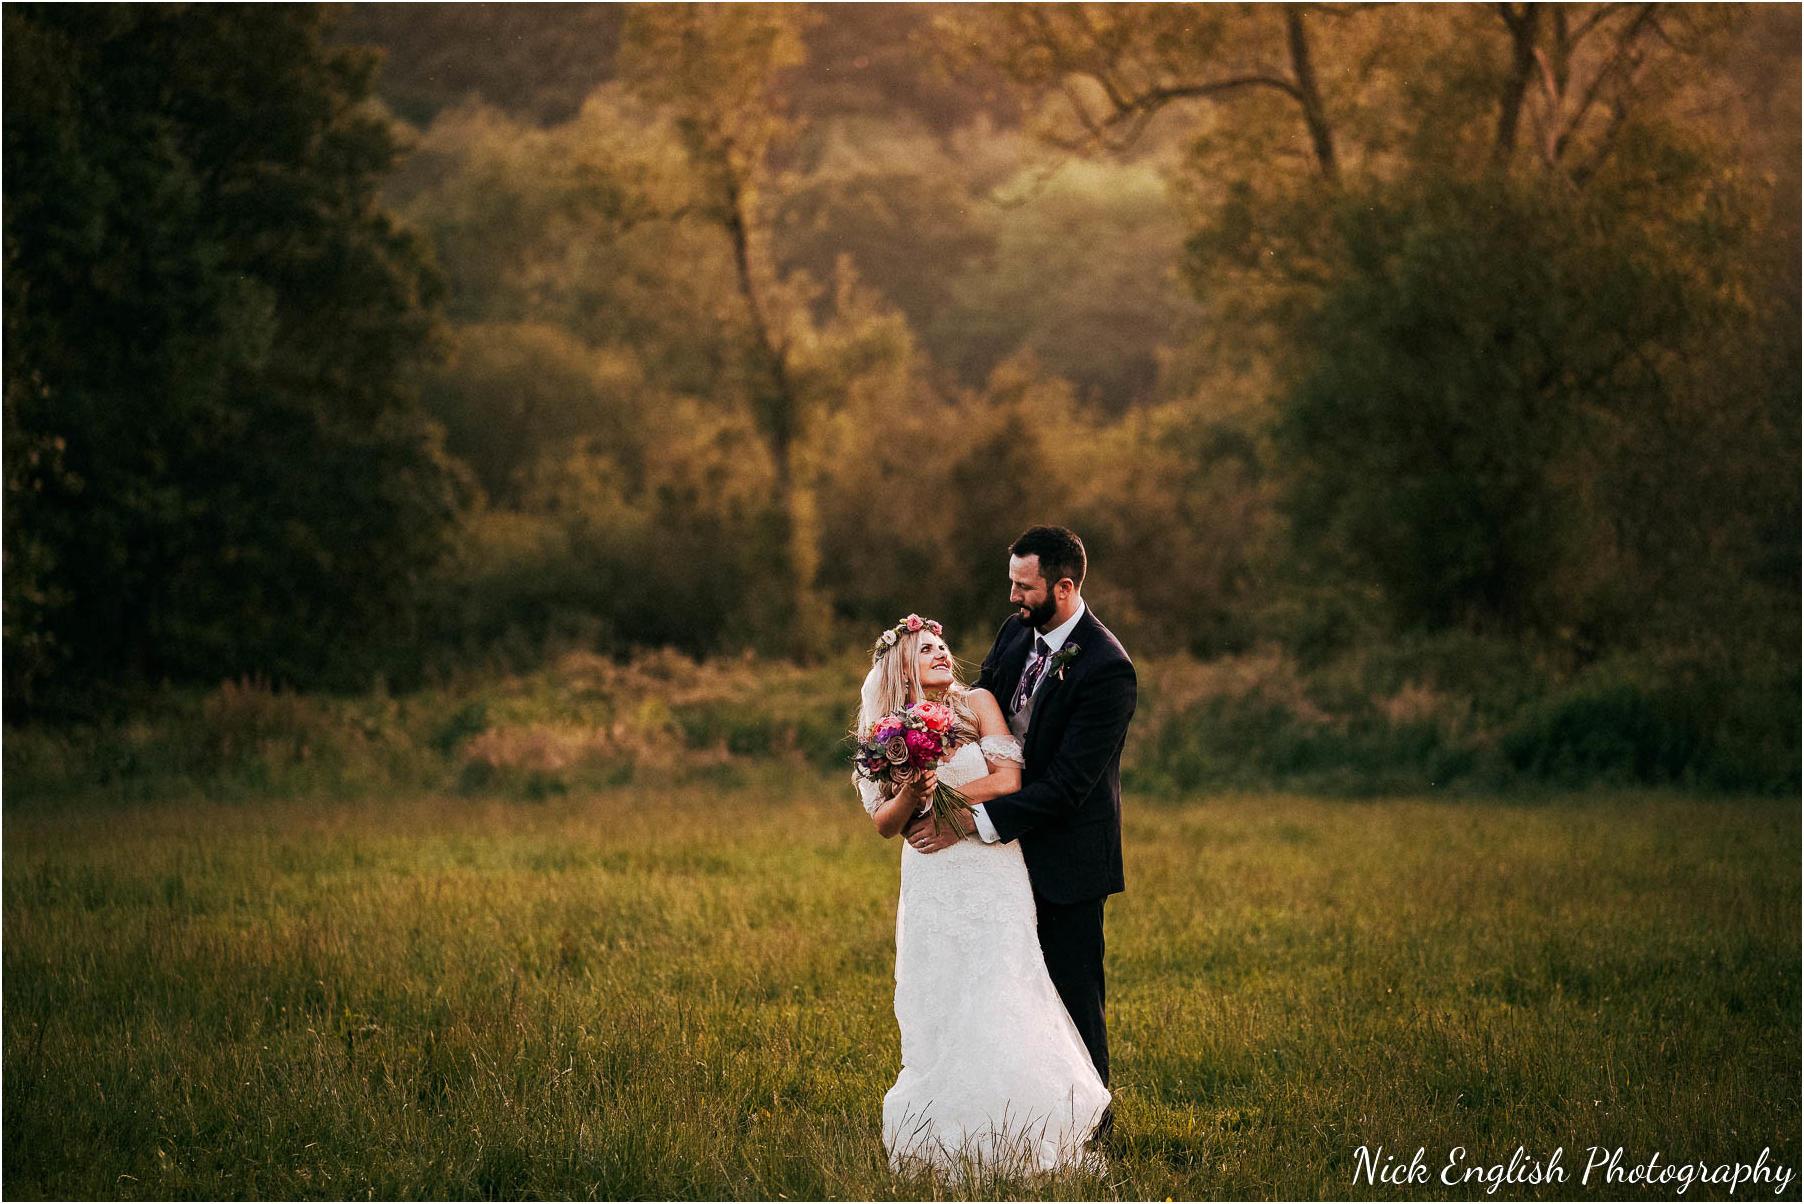 Whitebottom_Farm_Wedding_Manchester_Photograph-105.jpg